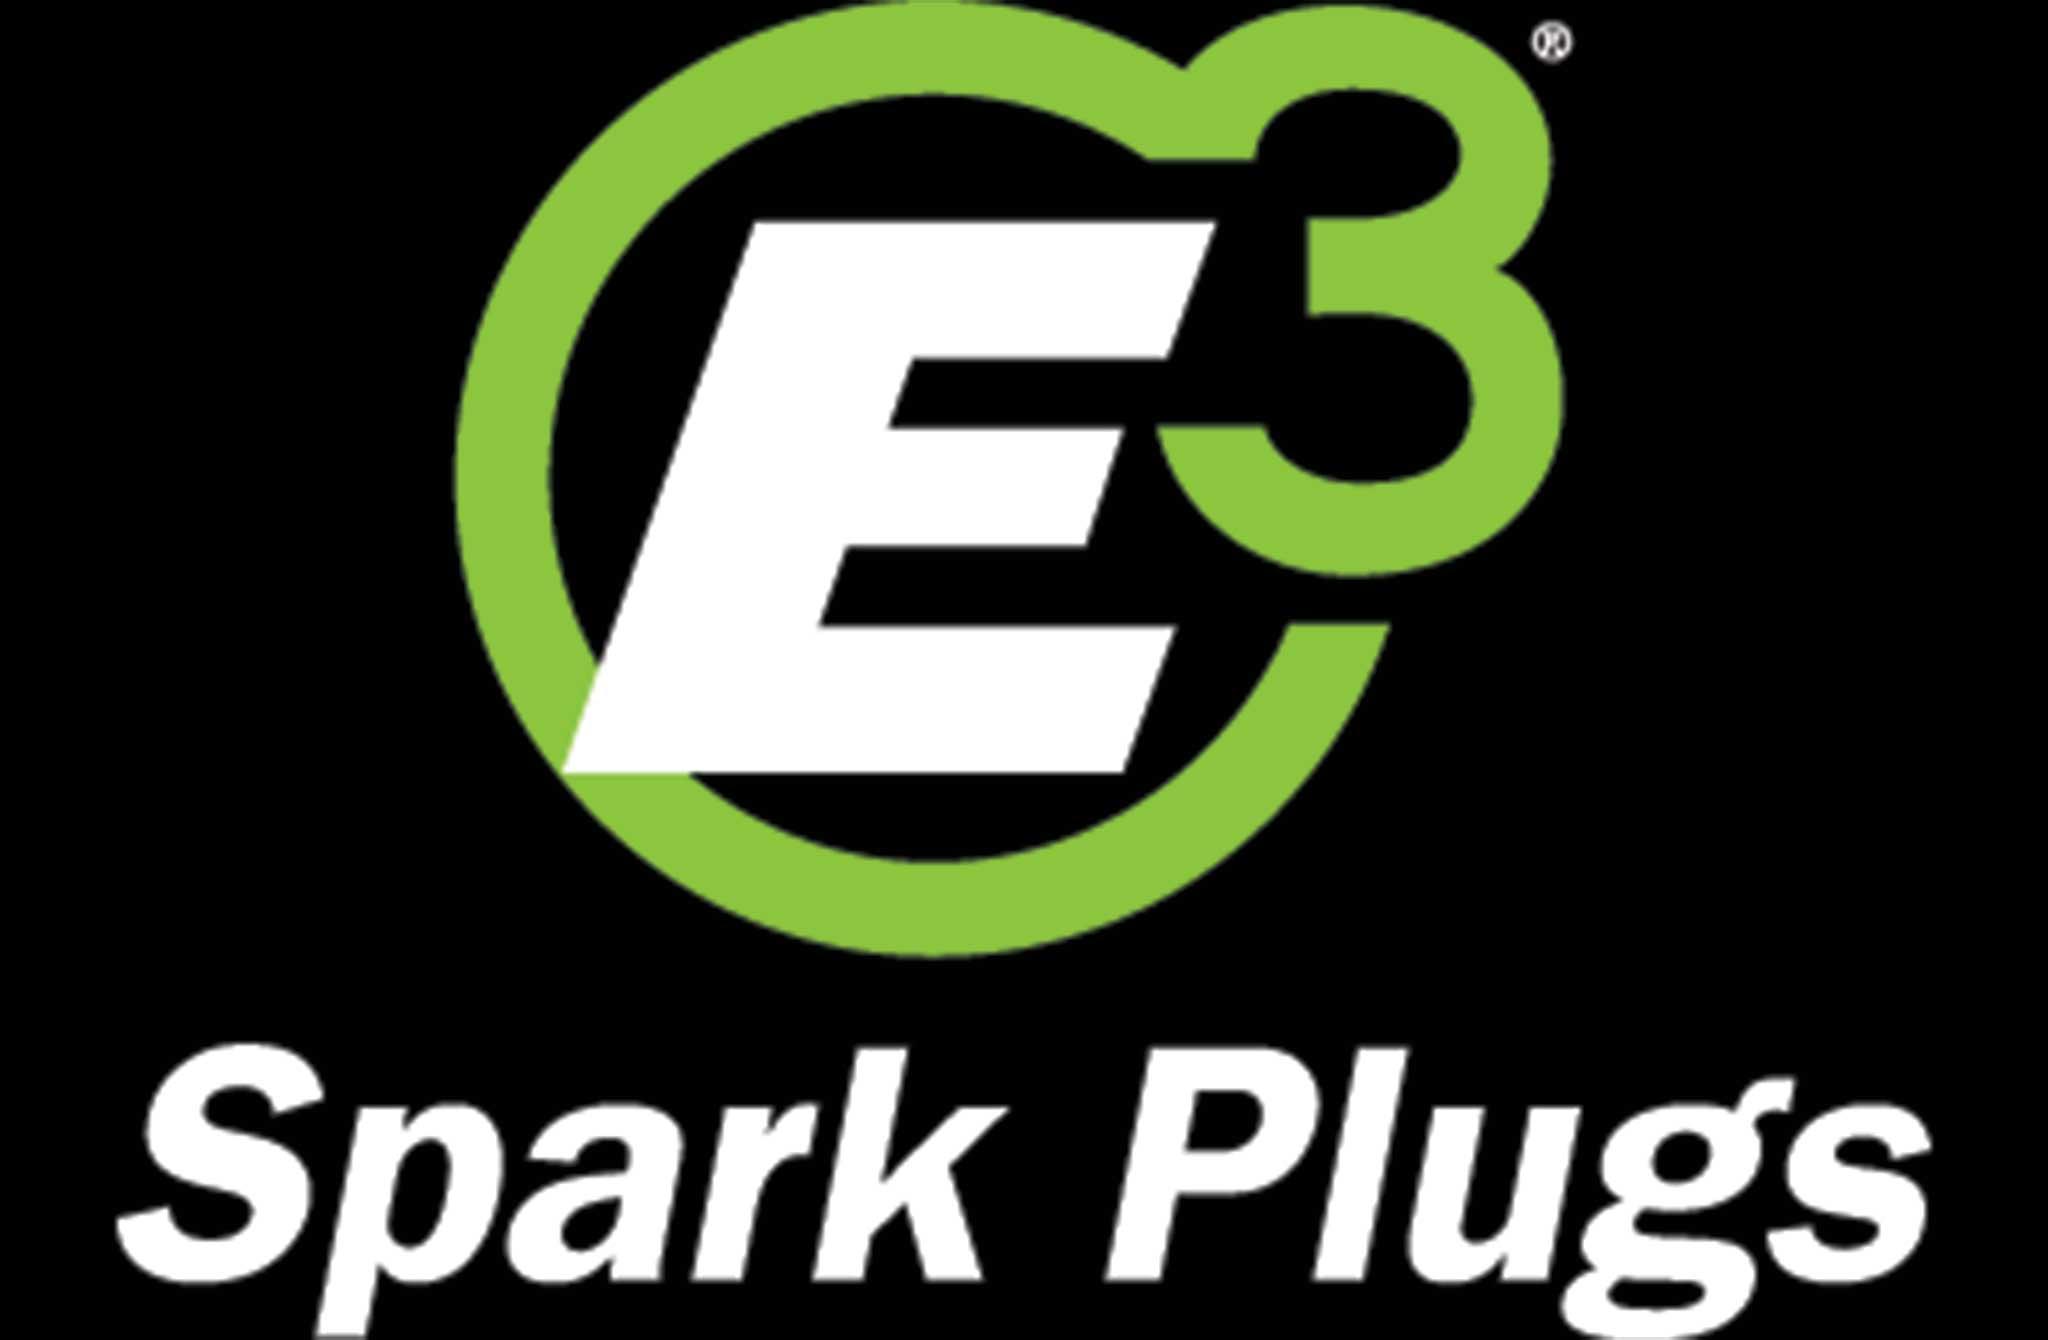 e3 spark plugs logo